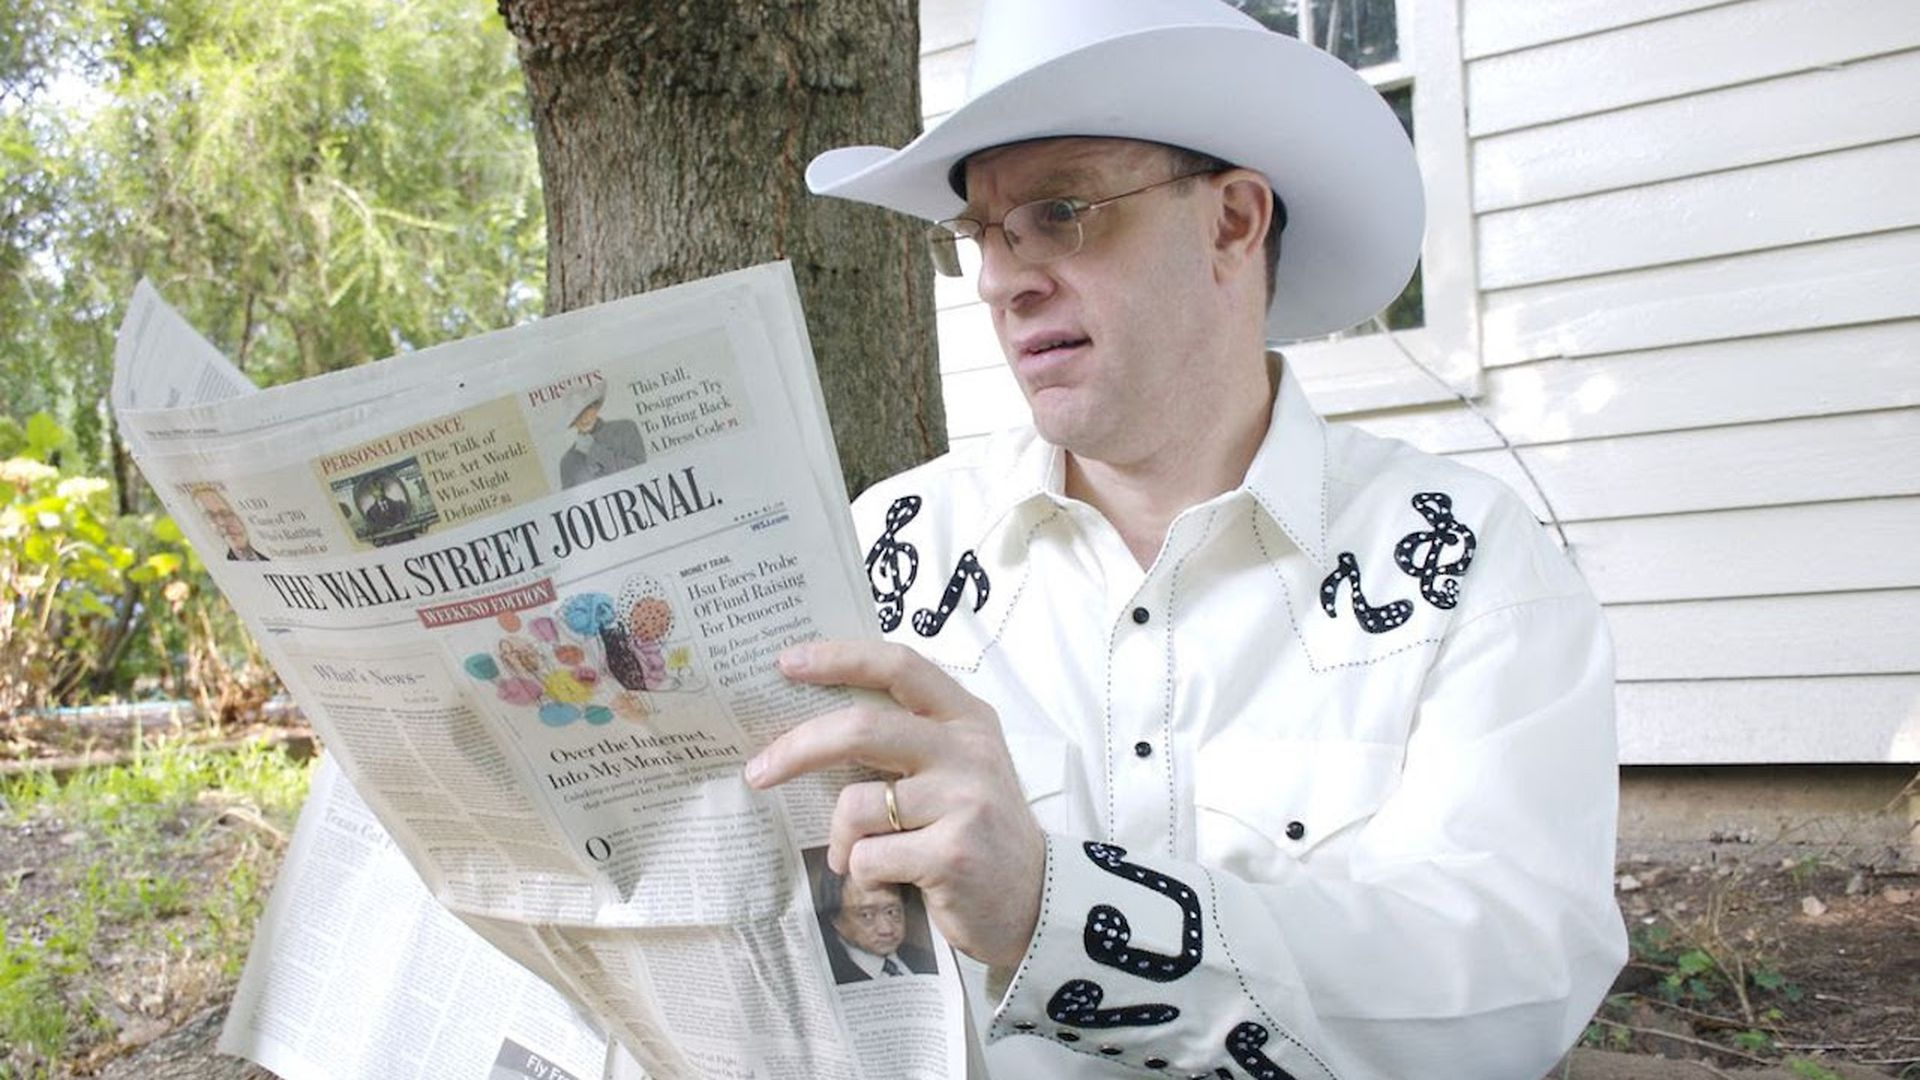 Merle Hazard reading a newspaper